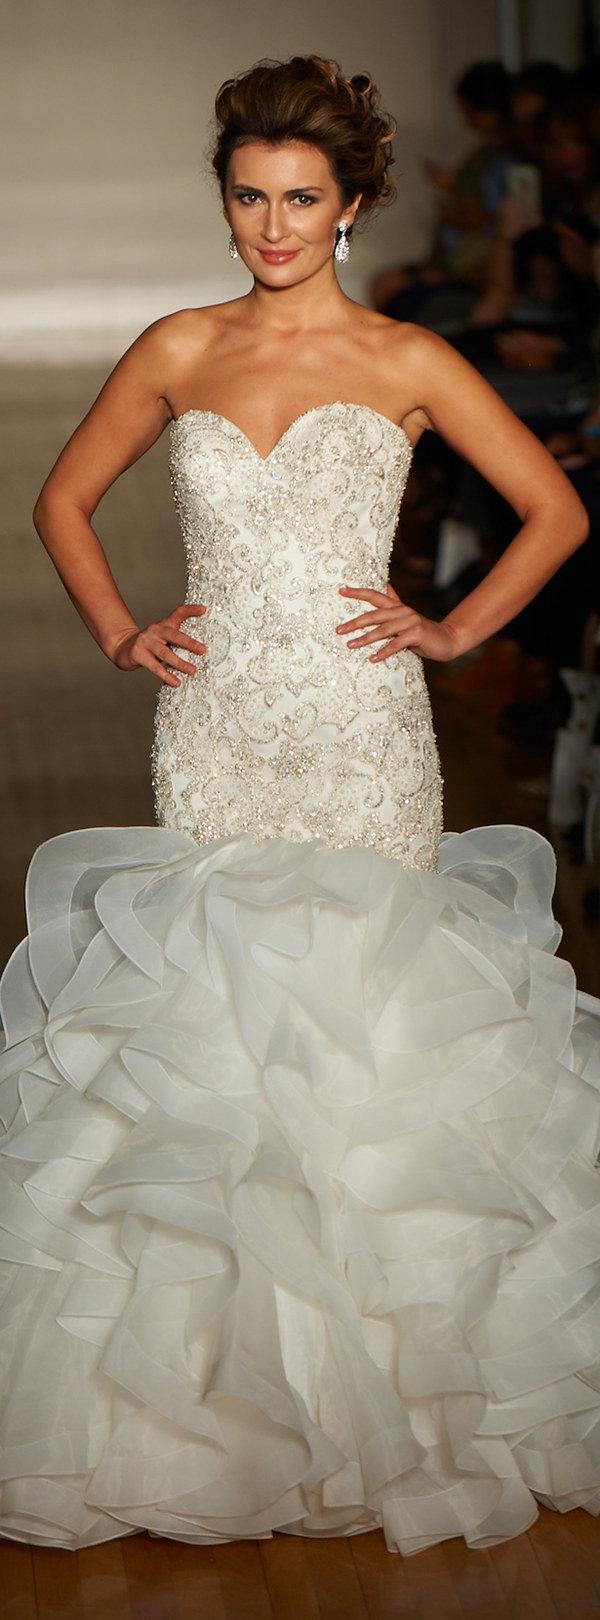 allure mermaid wedding dresses with ruffles